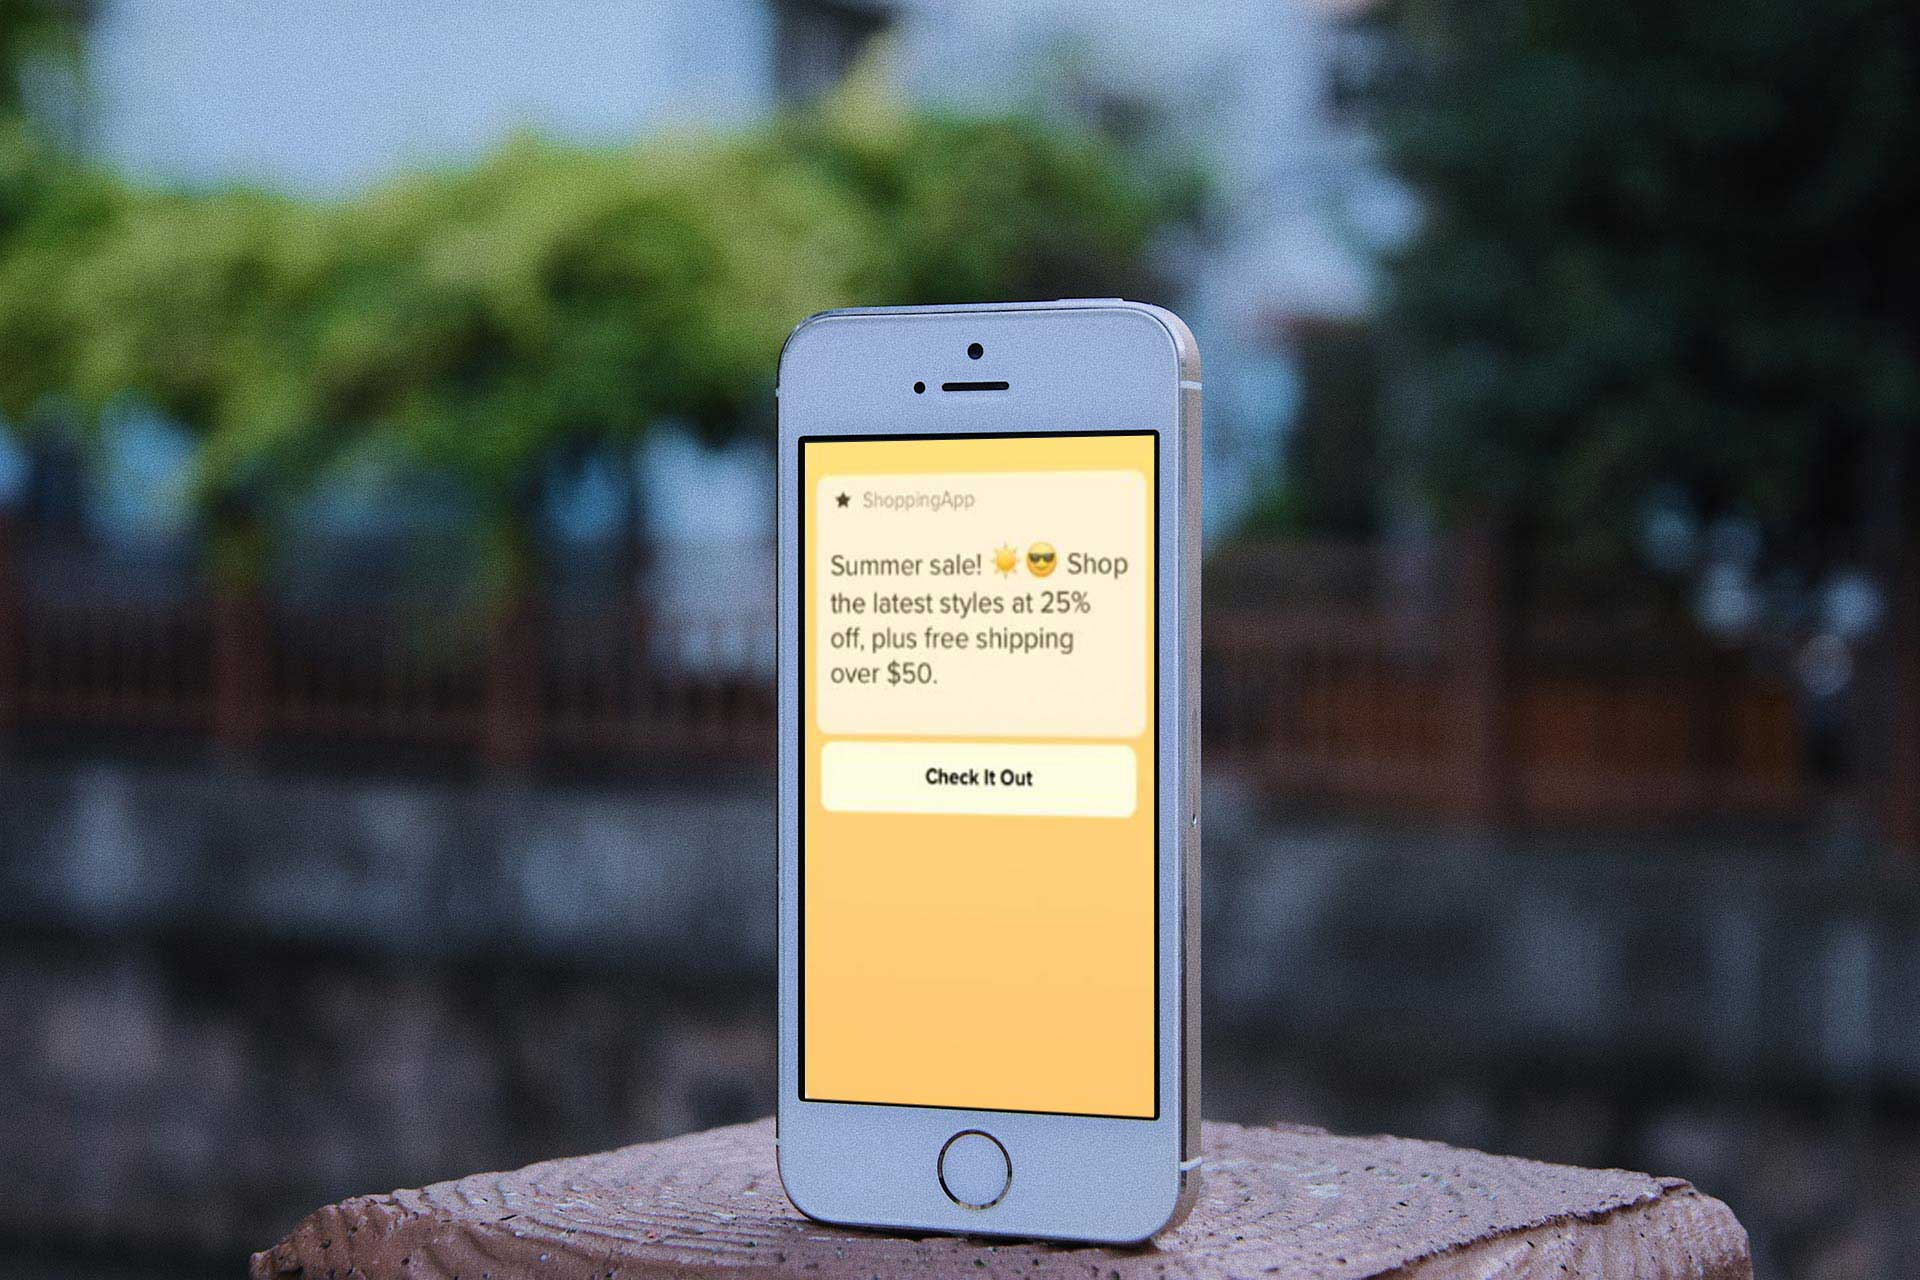 Shopify Summer Sale App notification